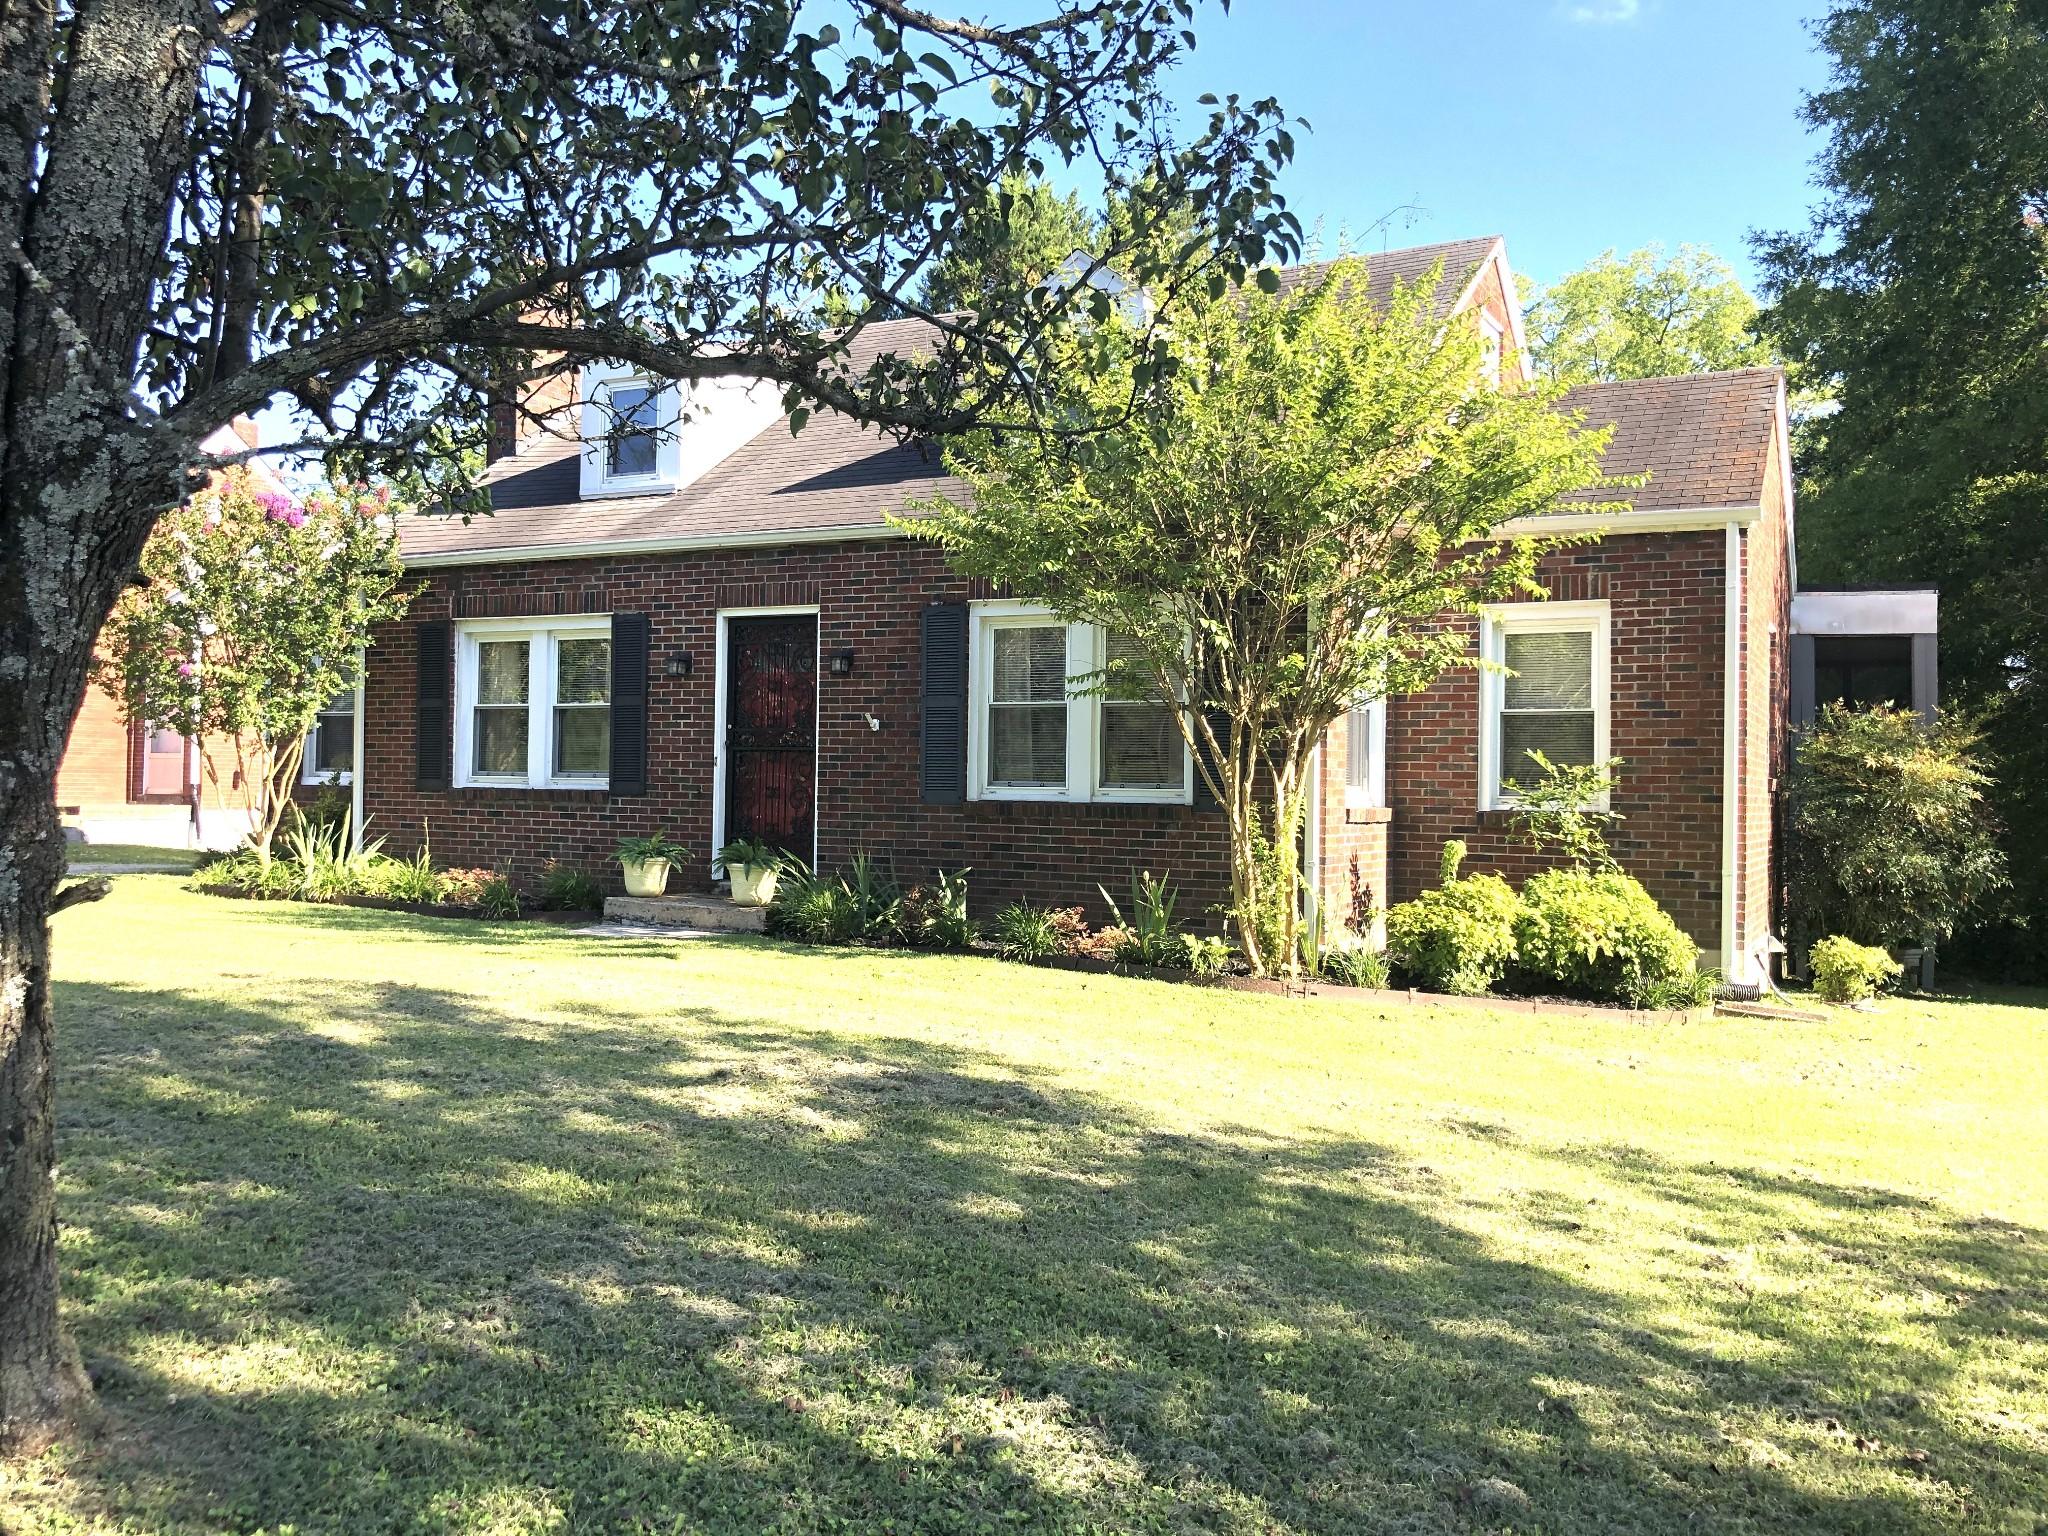 709 E College St Property Photo - Pulaski, TN real estate listing